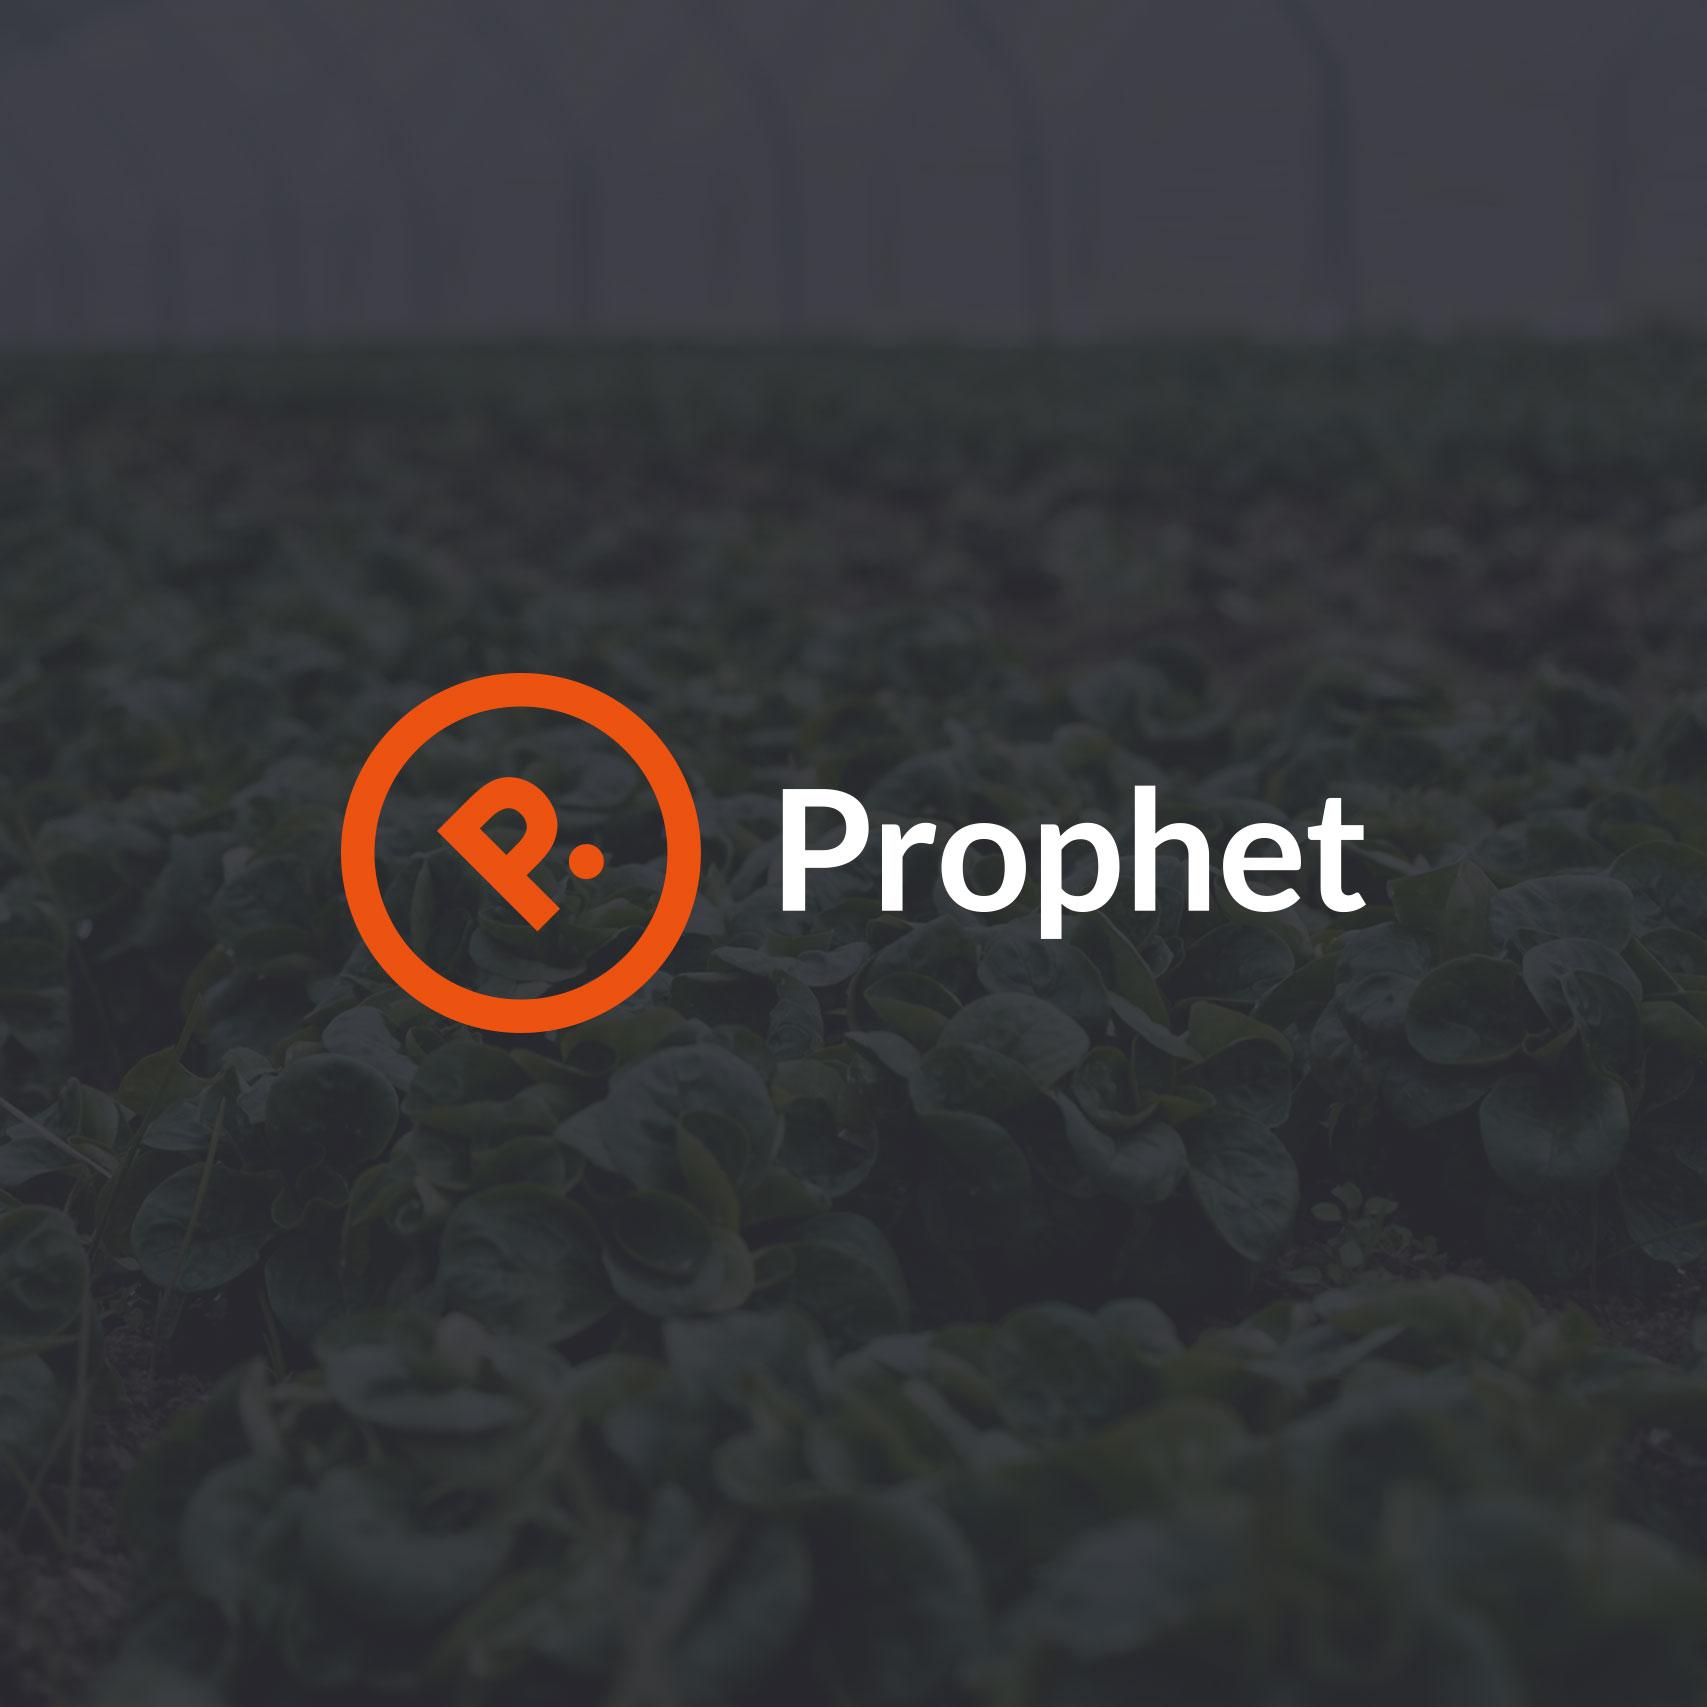 Creative logo design for Prophet London